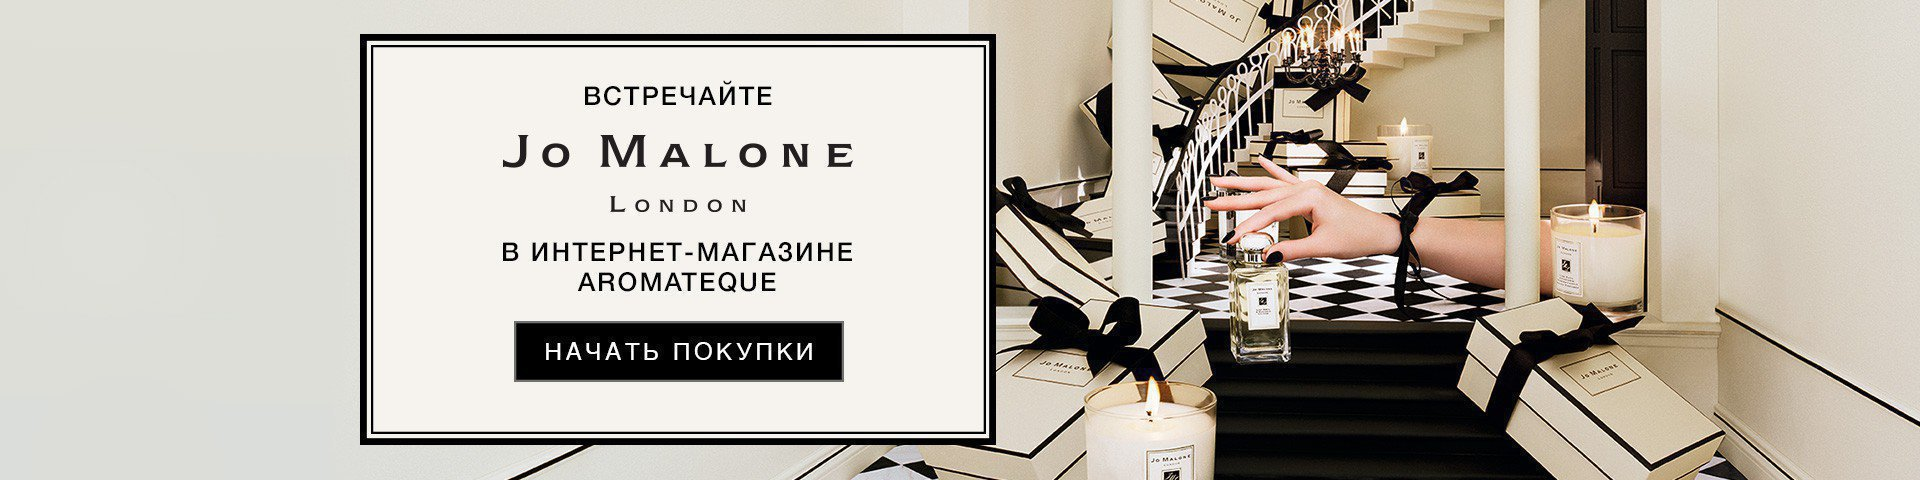 Продукция JoMalone доступна к заказу на сайте интернет-магазина